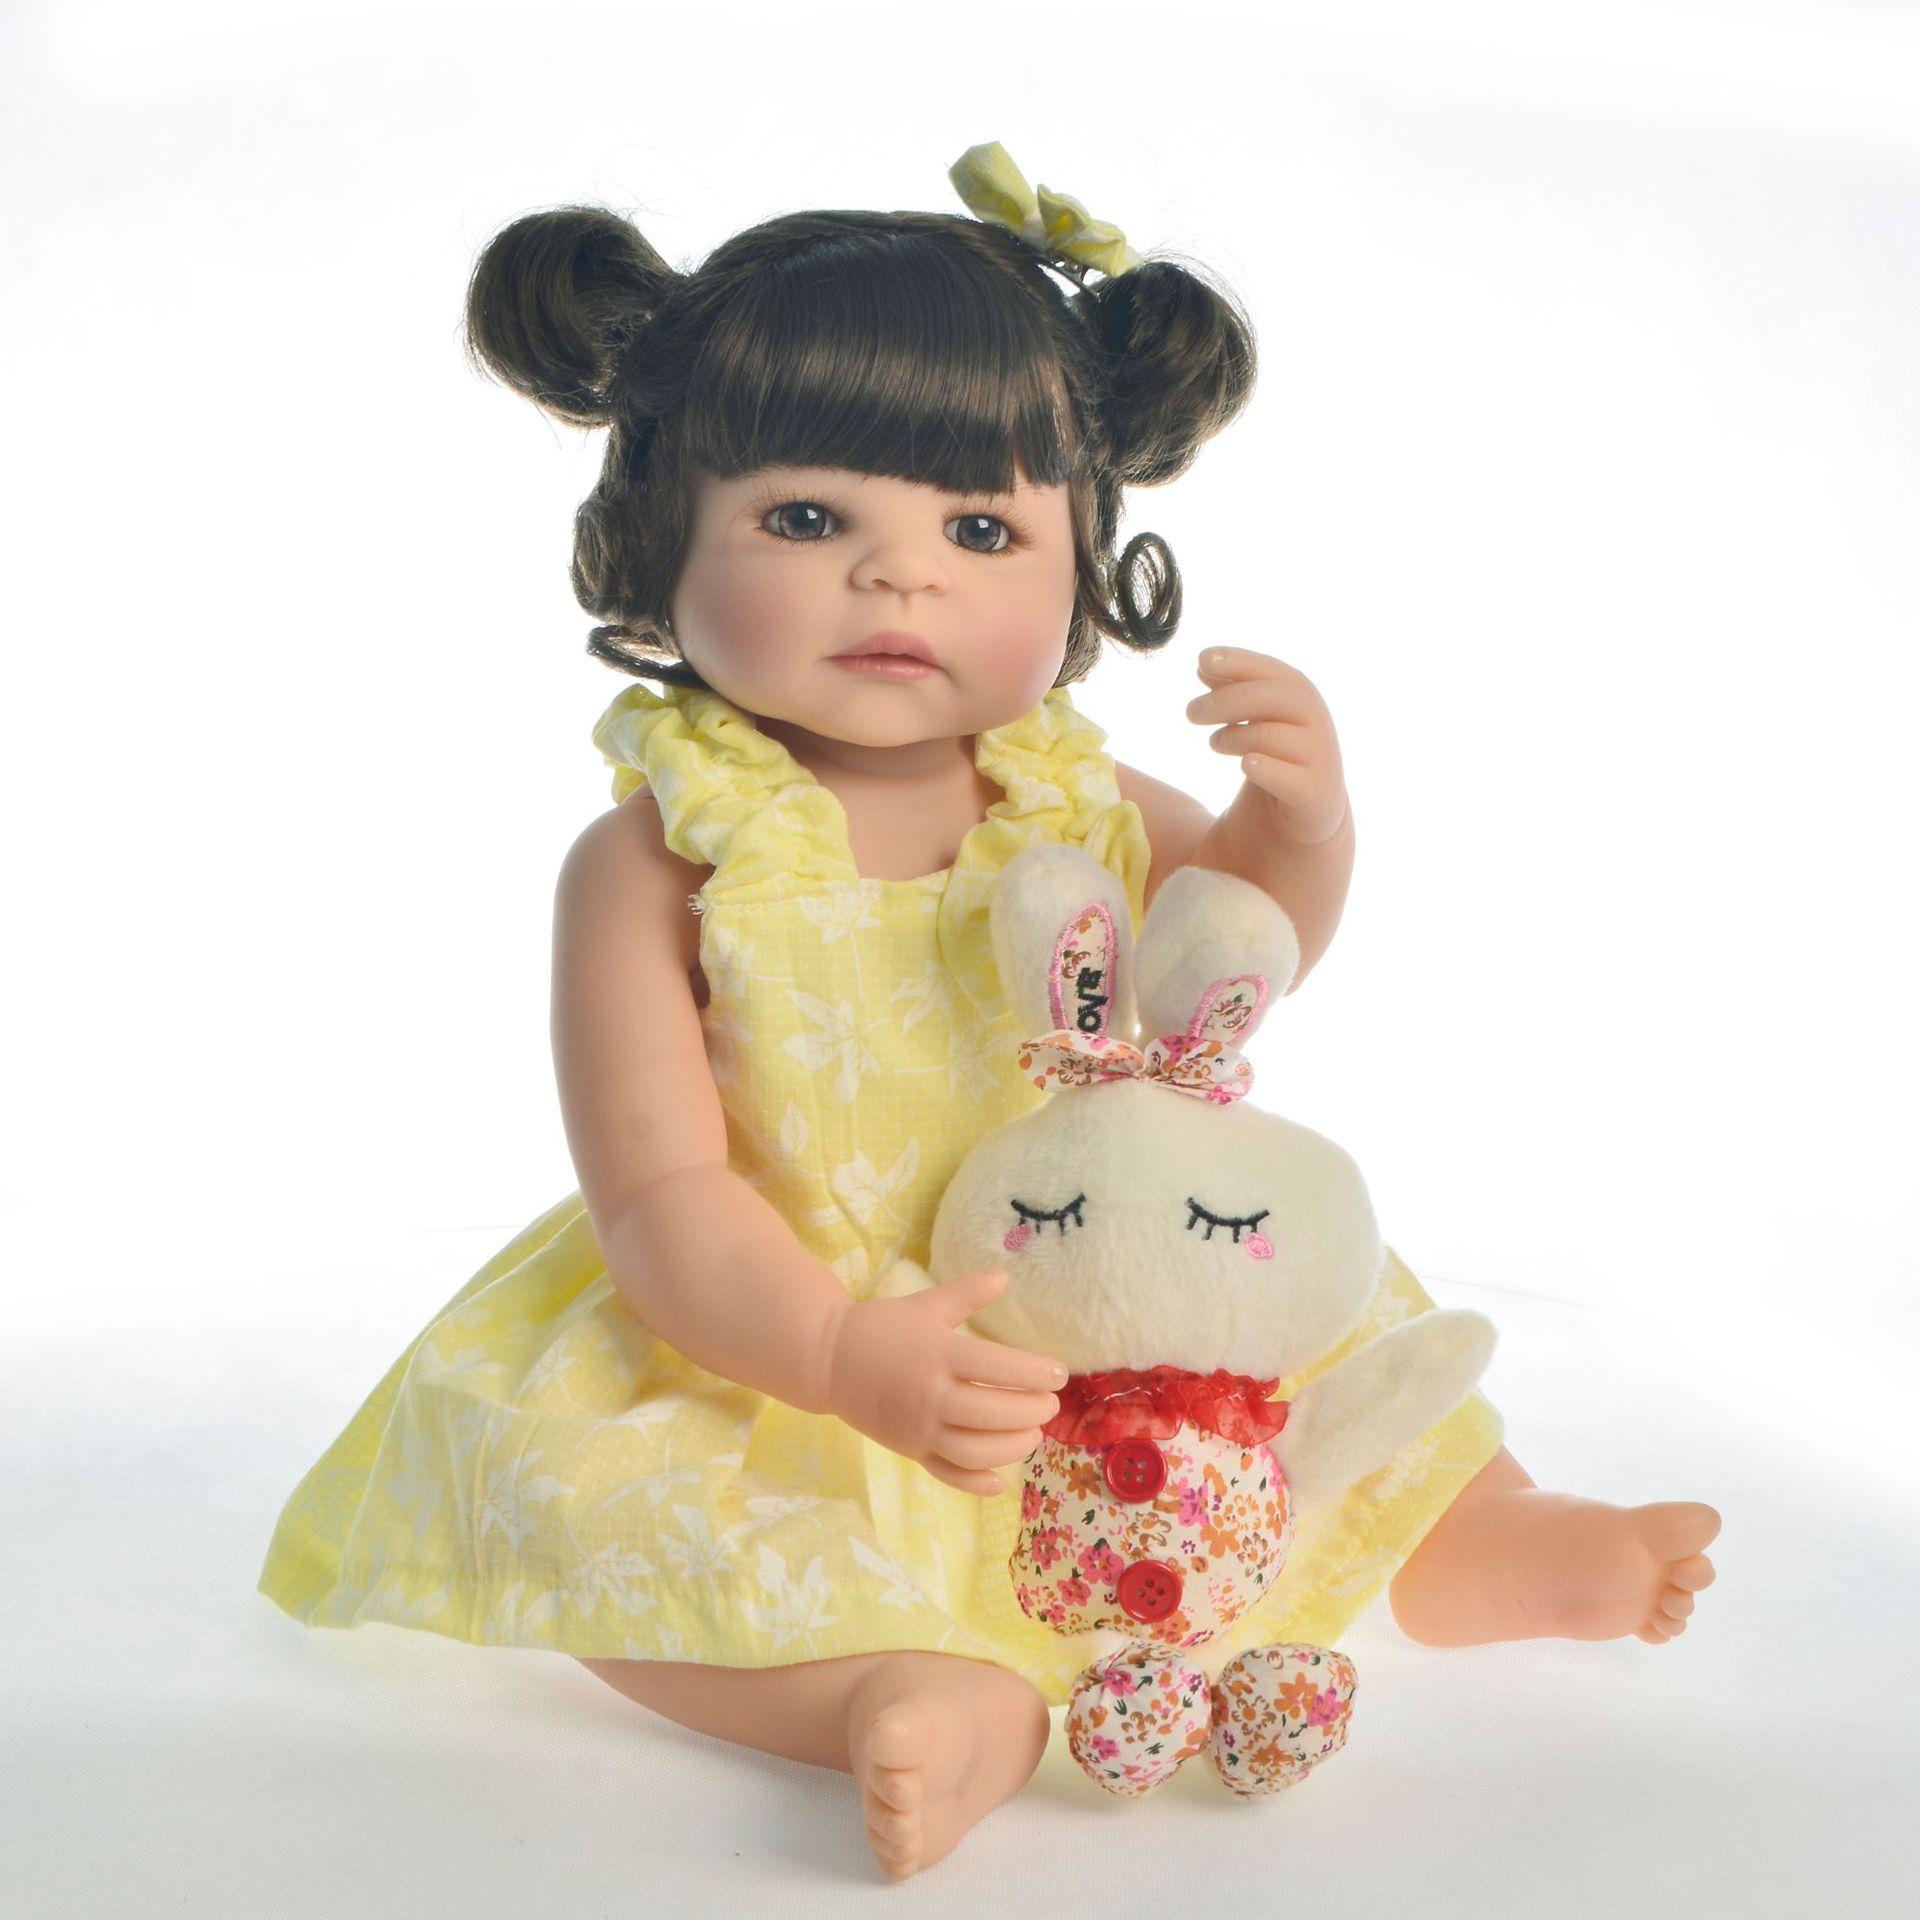 Bebes reborn doll 55cm Full Silicone reborn baby doll pretty girl toddler boneca reborn surprise gift l.o.l doll toys